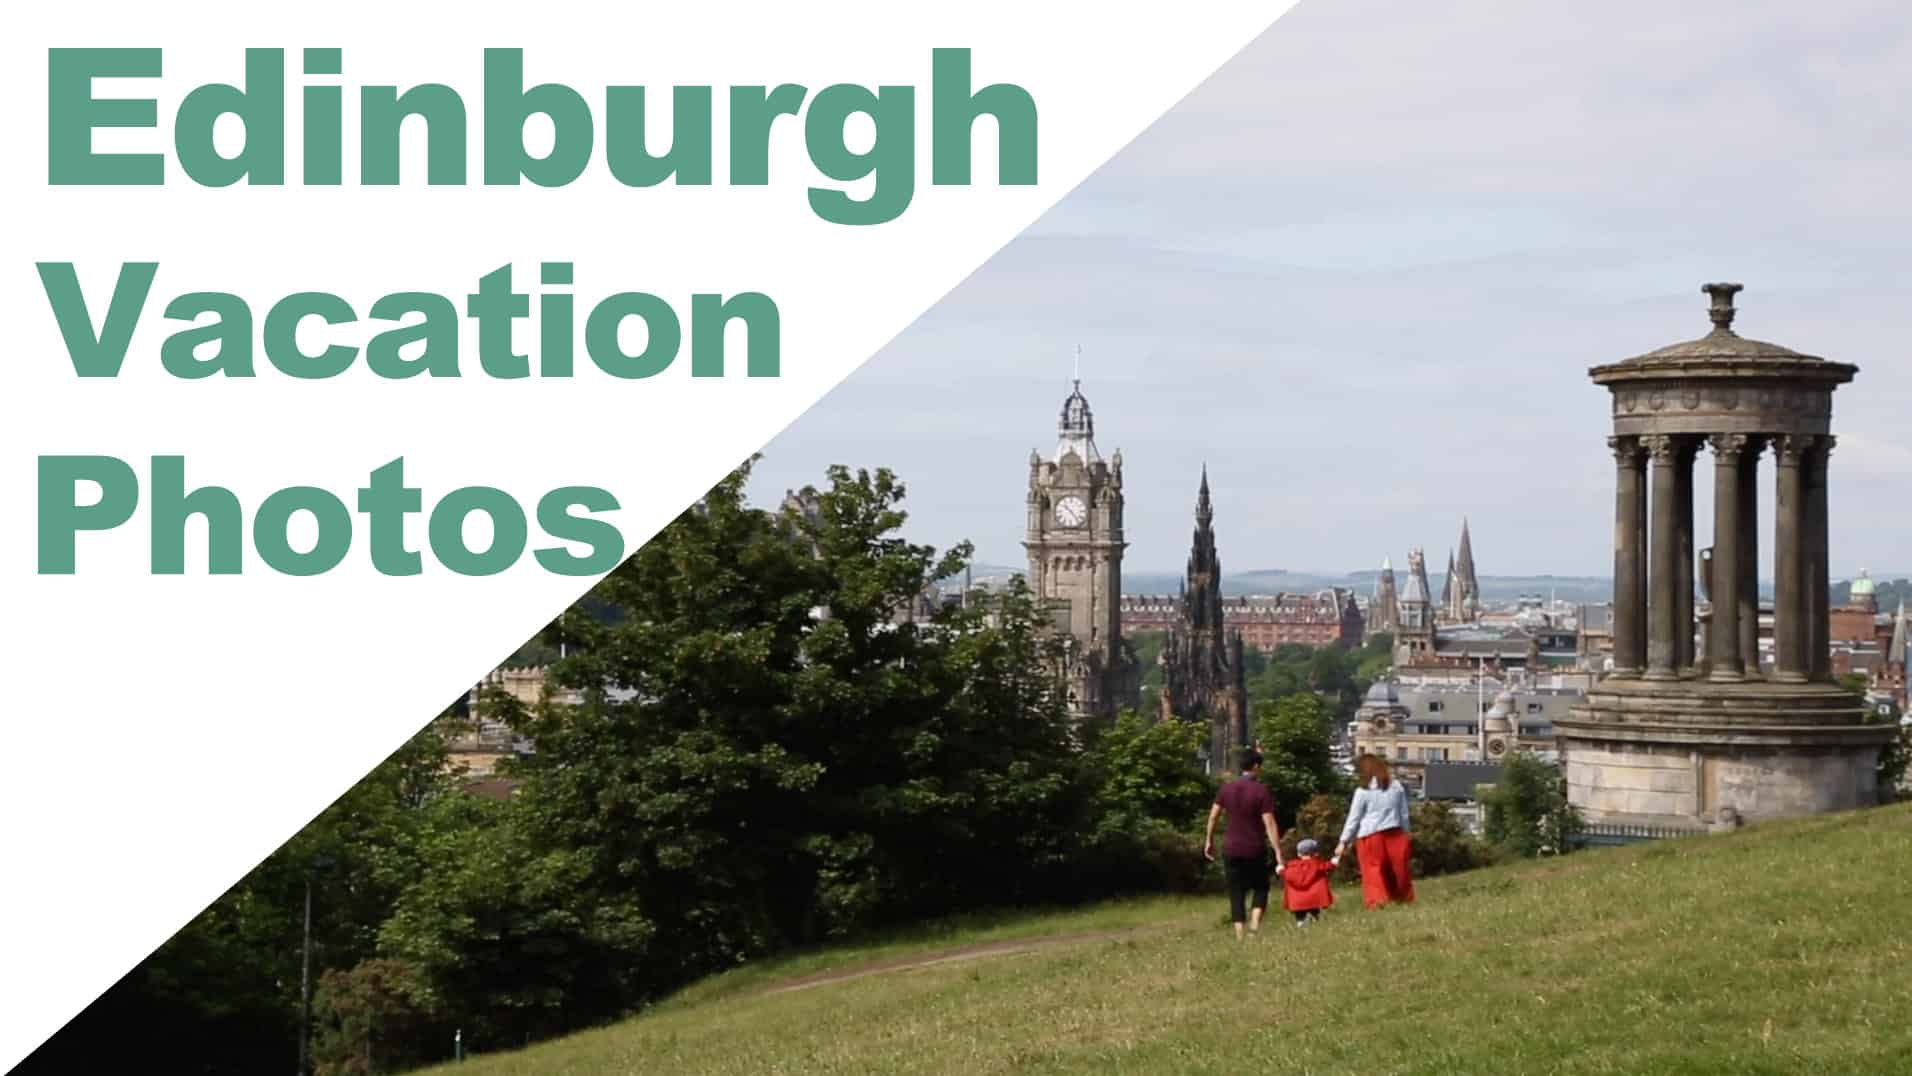 Family vacation in Edinburgh enjoying tourist attractions